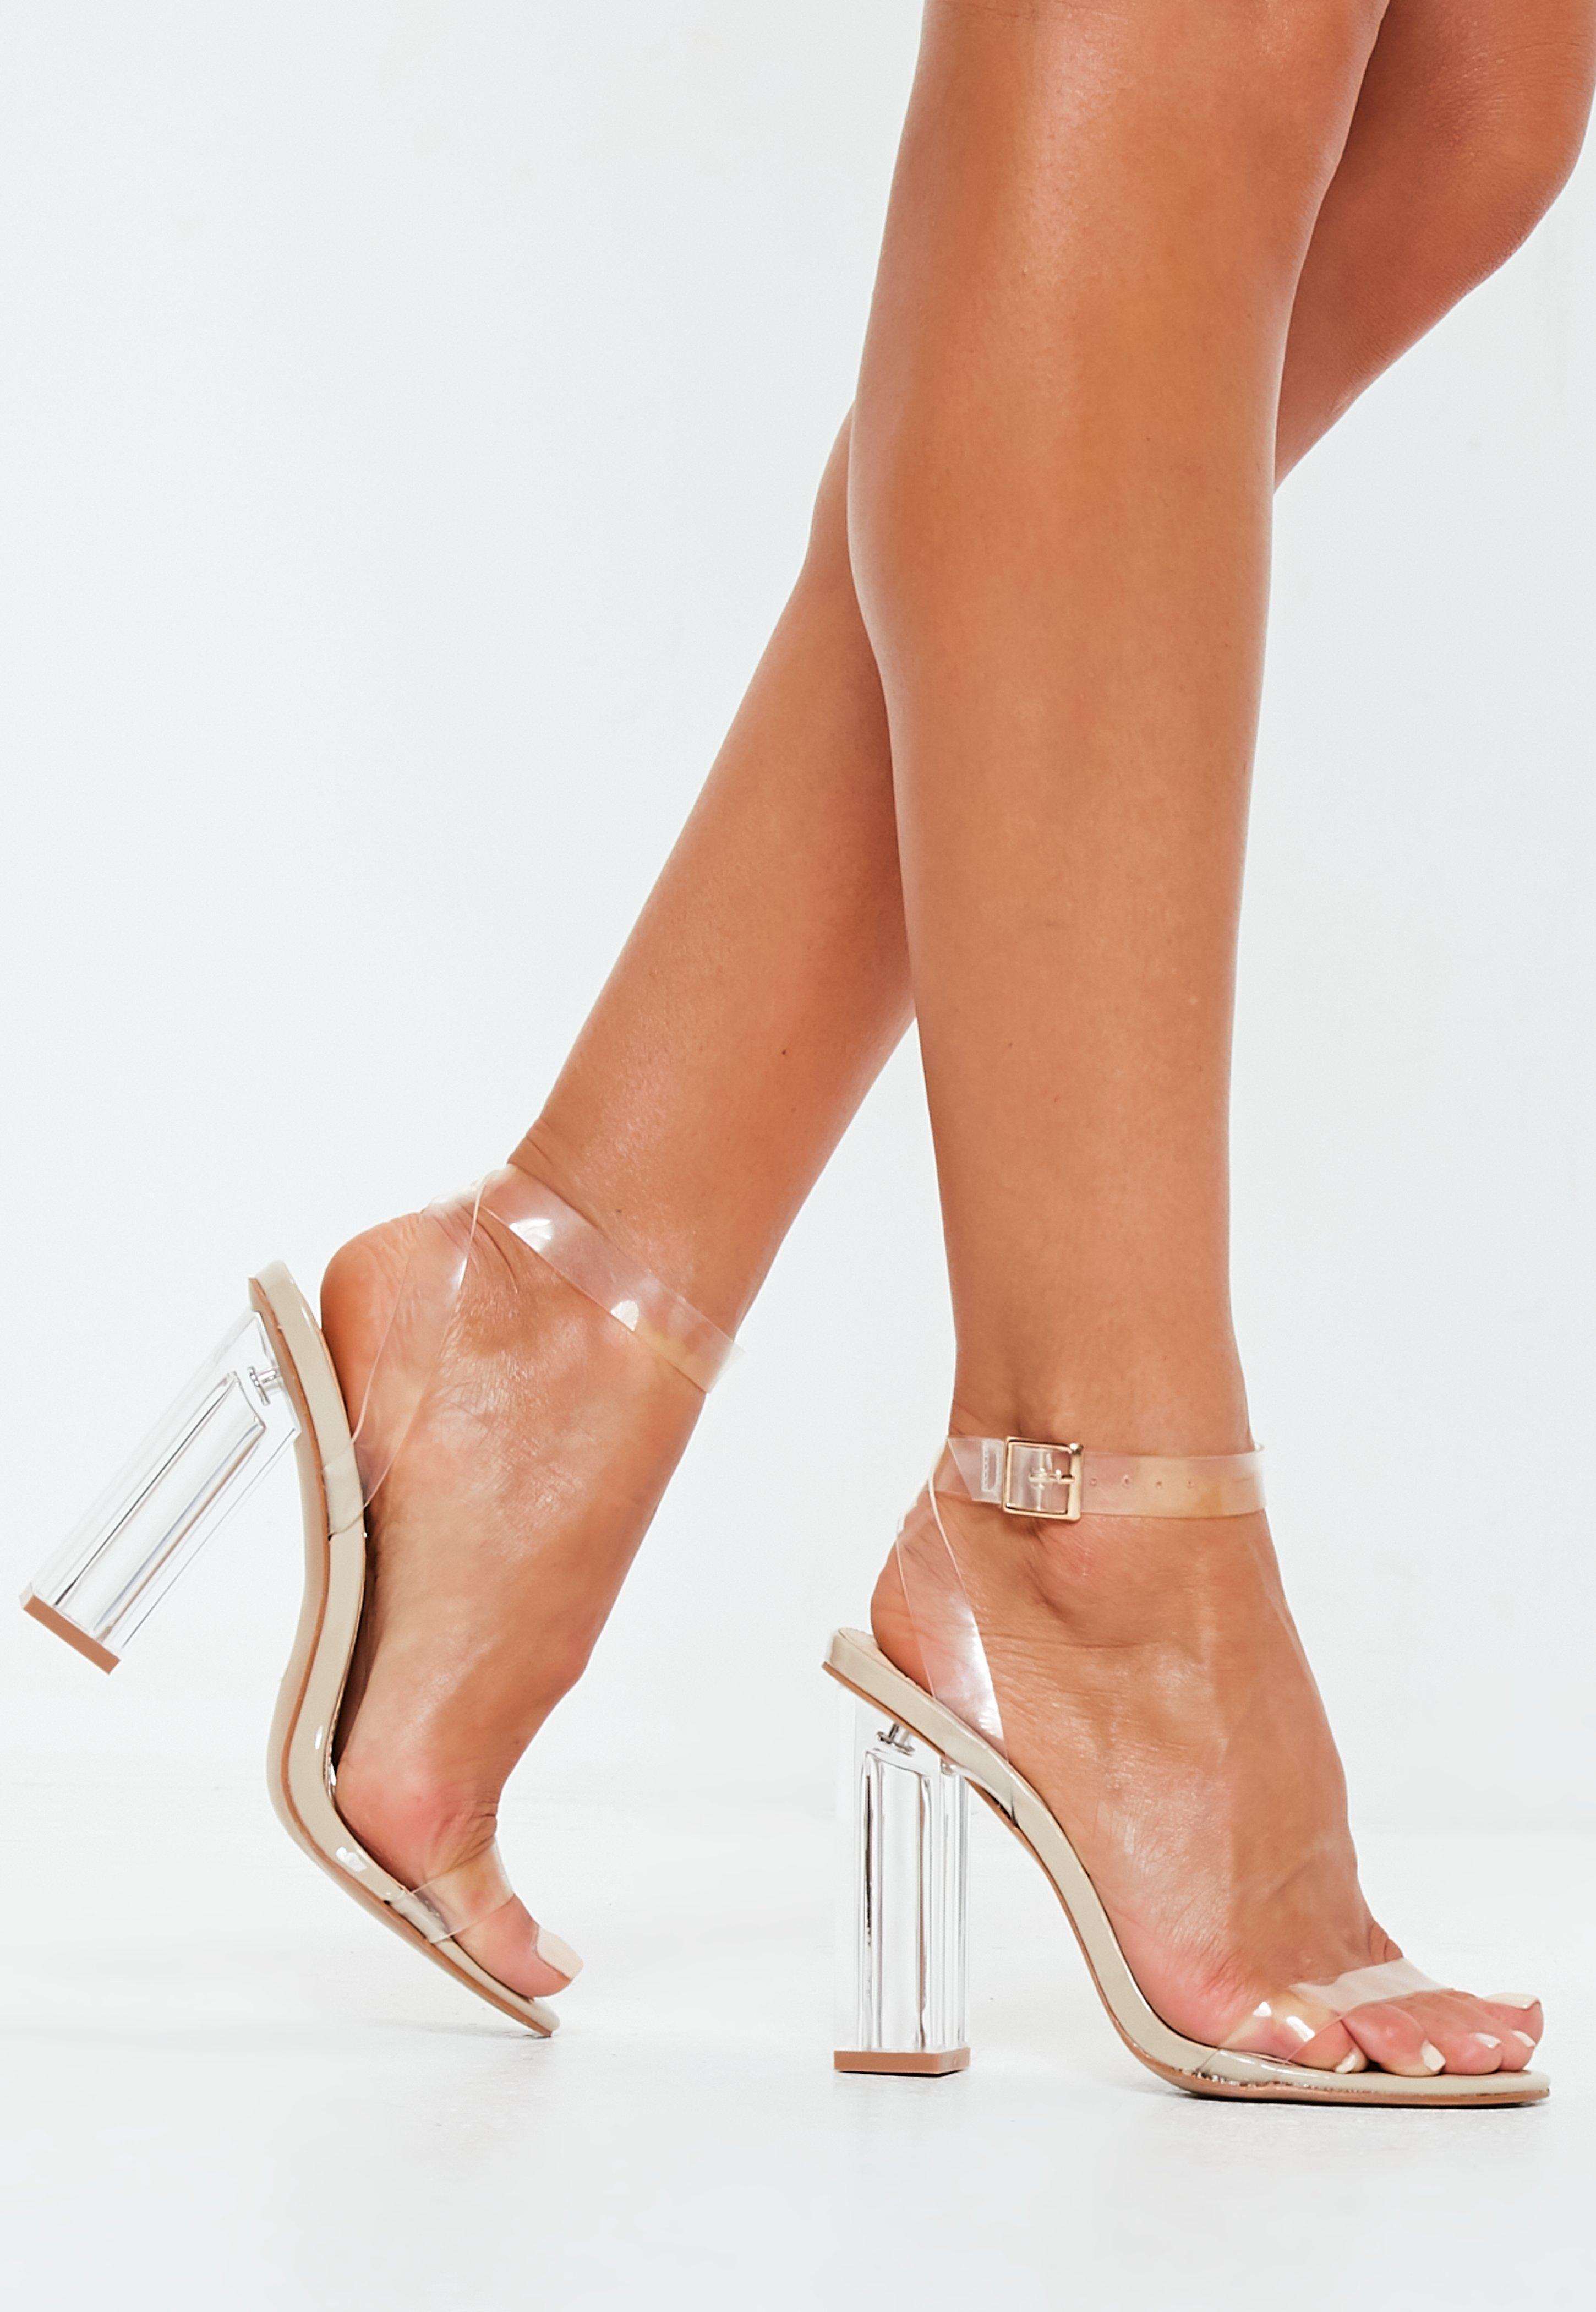 9b6123be533 Clear transparent heels missguided ireland jpg 2900x4200 Clear sandals heels